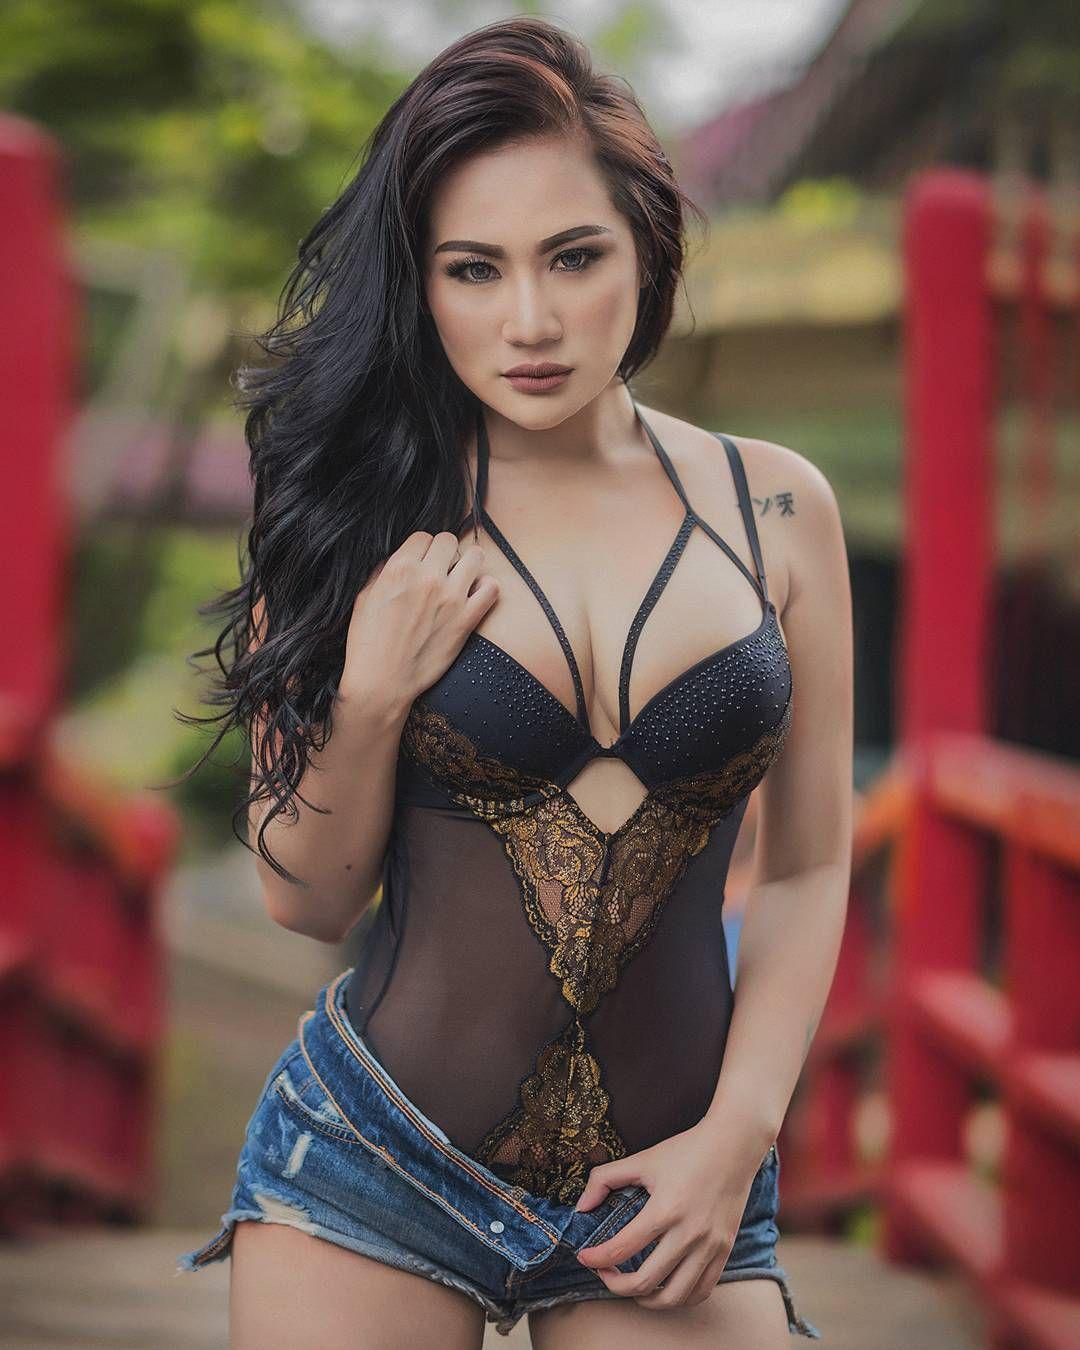 Comments Official Fgirls Magazine Fgirls_indonesia On Instagram